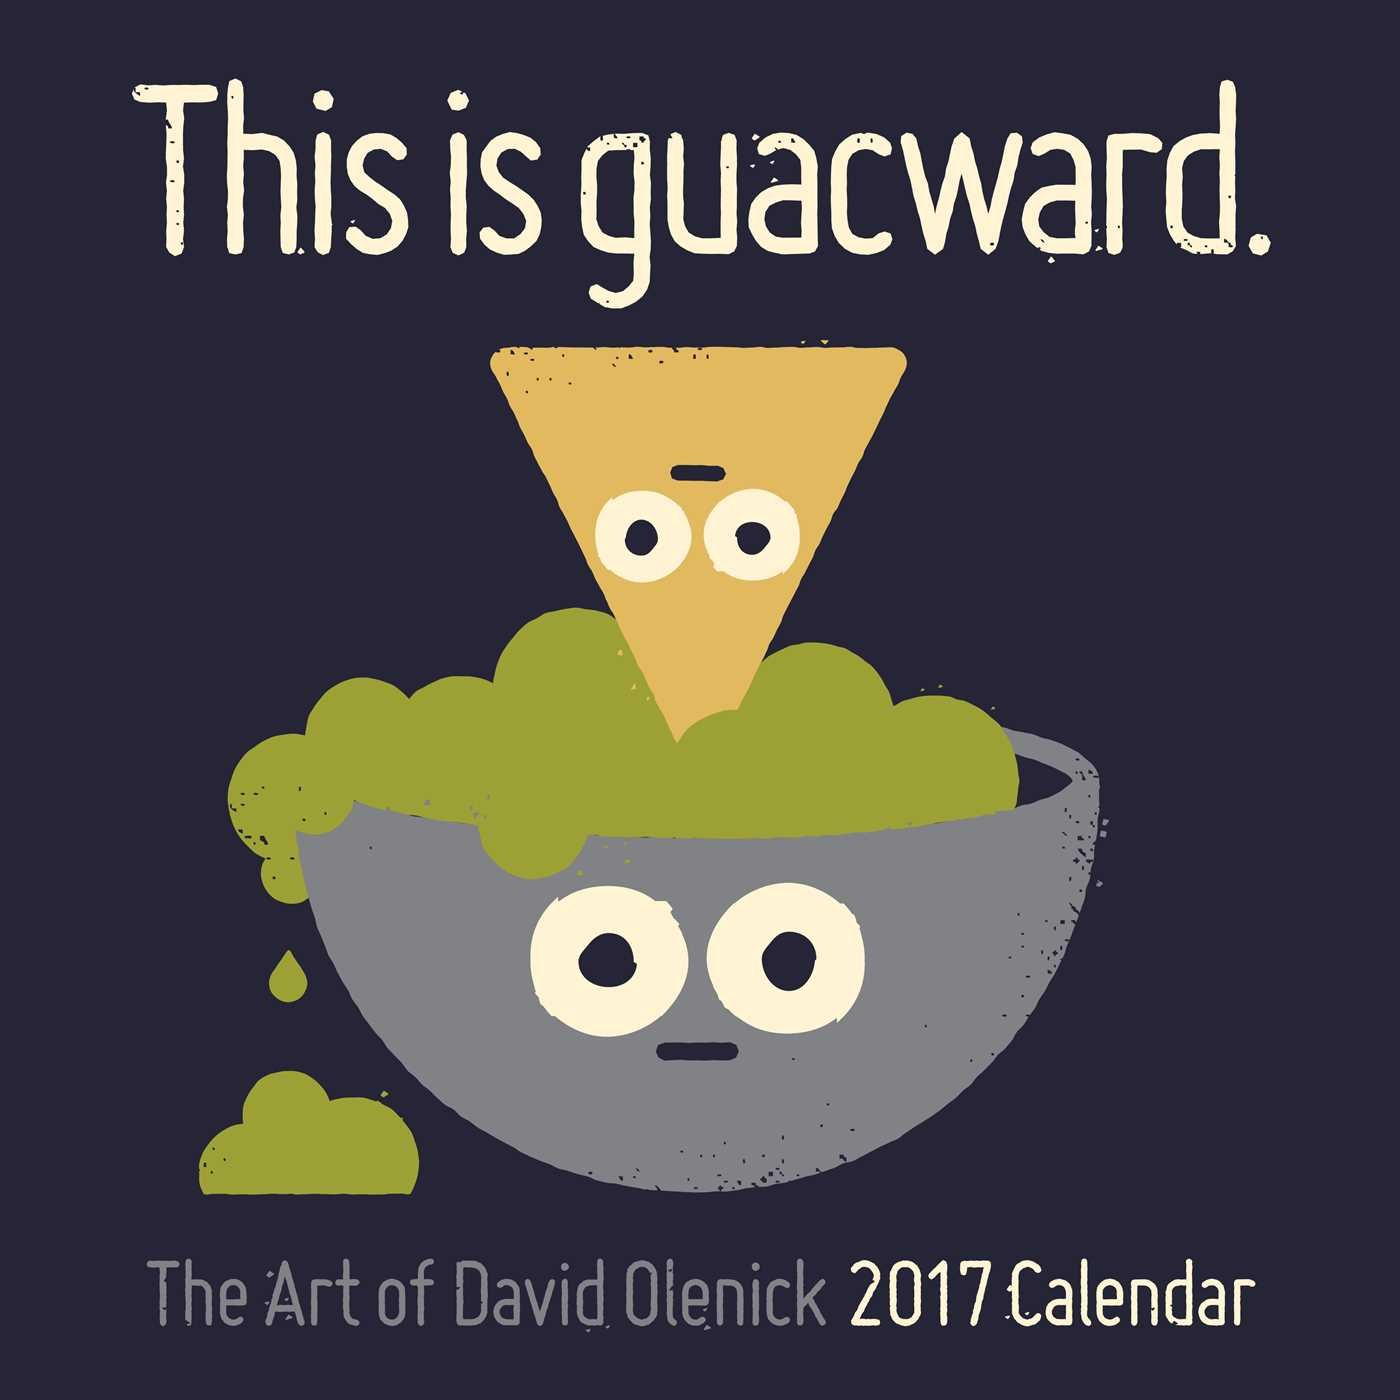 The Art of David Olenick 2017 Wall Calendar: This is guacward.: David  Olenick: 9781449476649: Amazon.com: Books